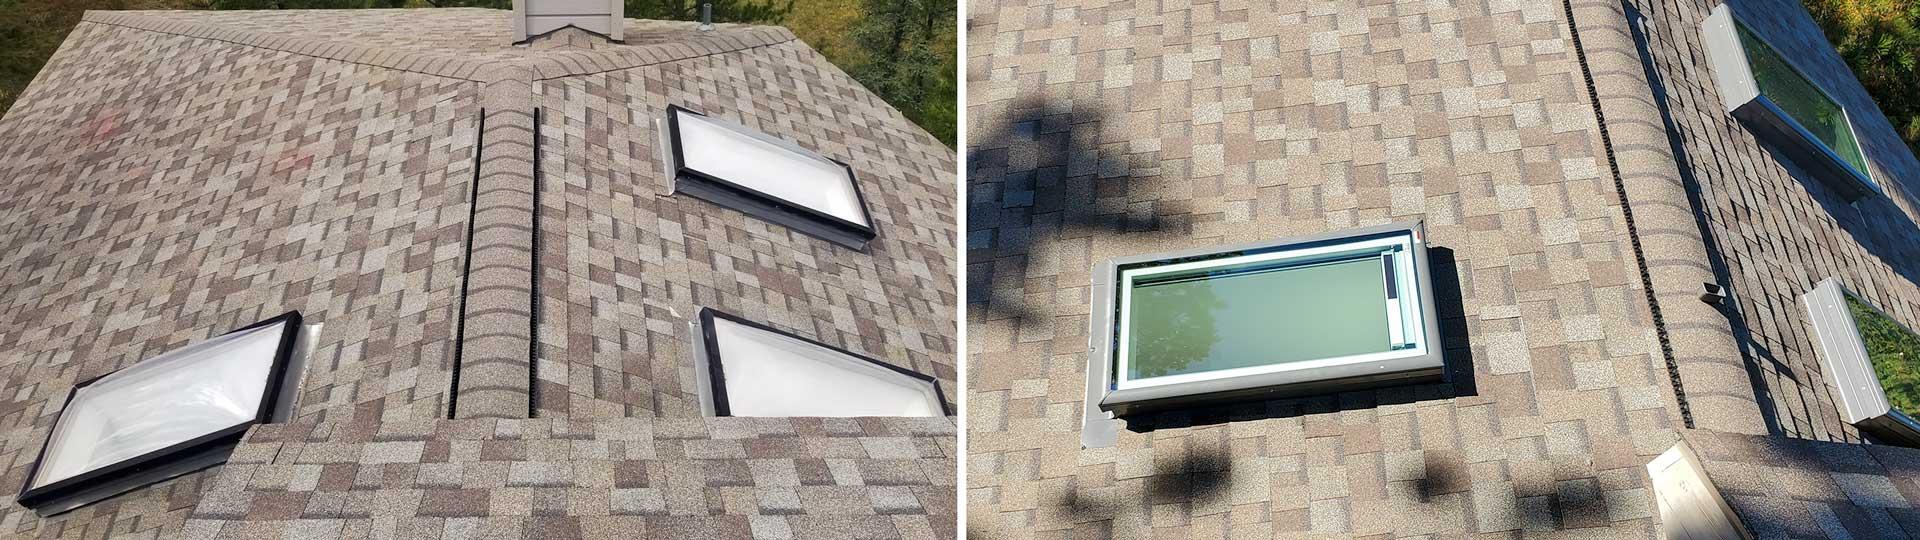 skylight replacement Evergreen 29888-134120